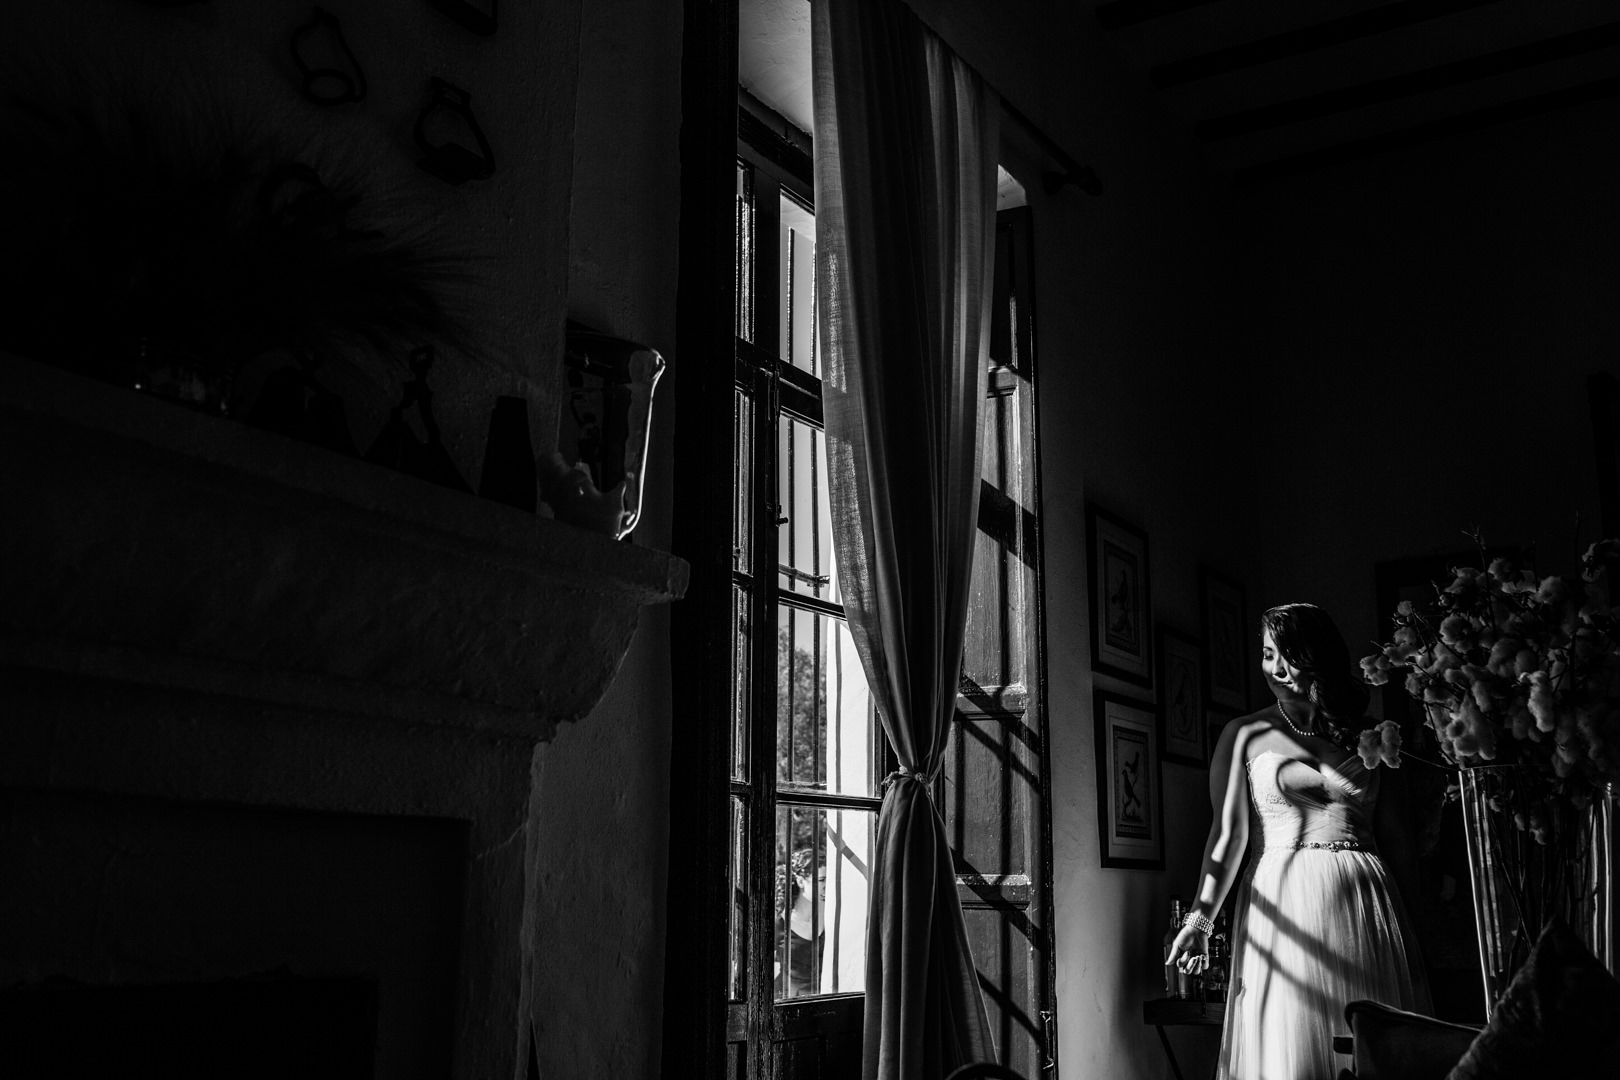 Boda-Hacienda-San-Rafael-Sevilla-engagement-Rafael-Torres-fotografo-bodas-sevilla-madrid-barcelona-wedding-photographer--43.jpg